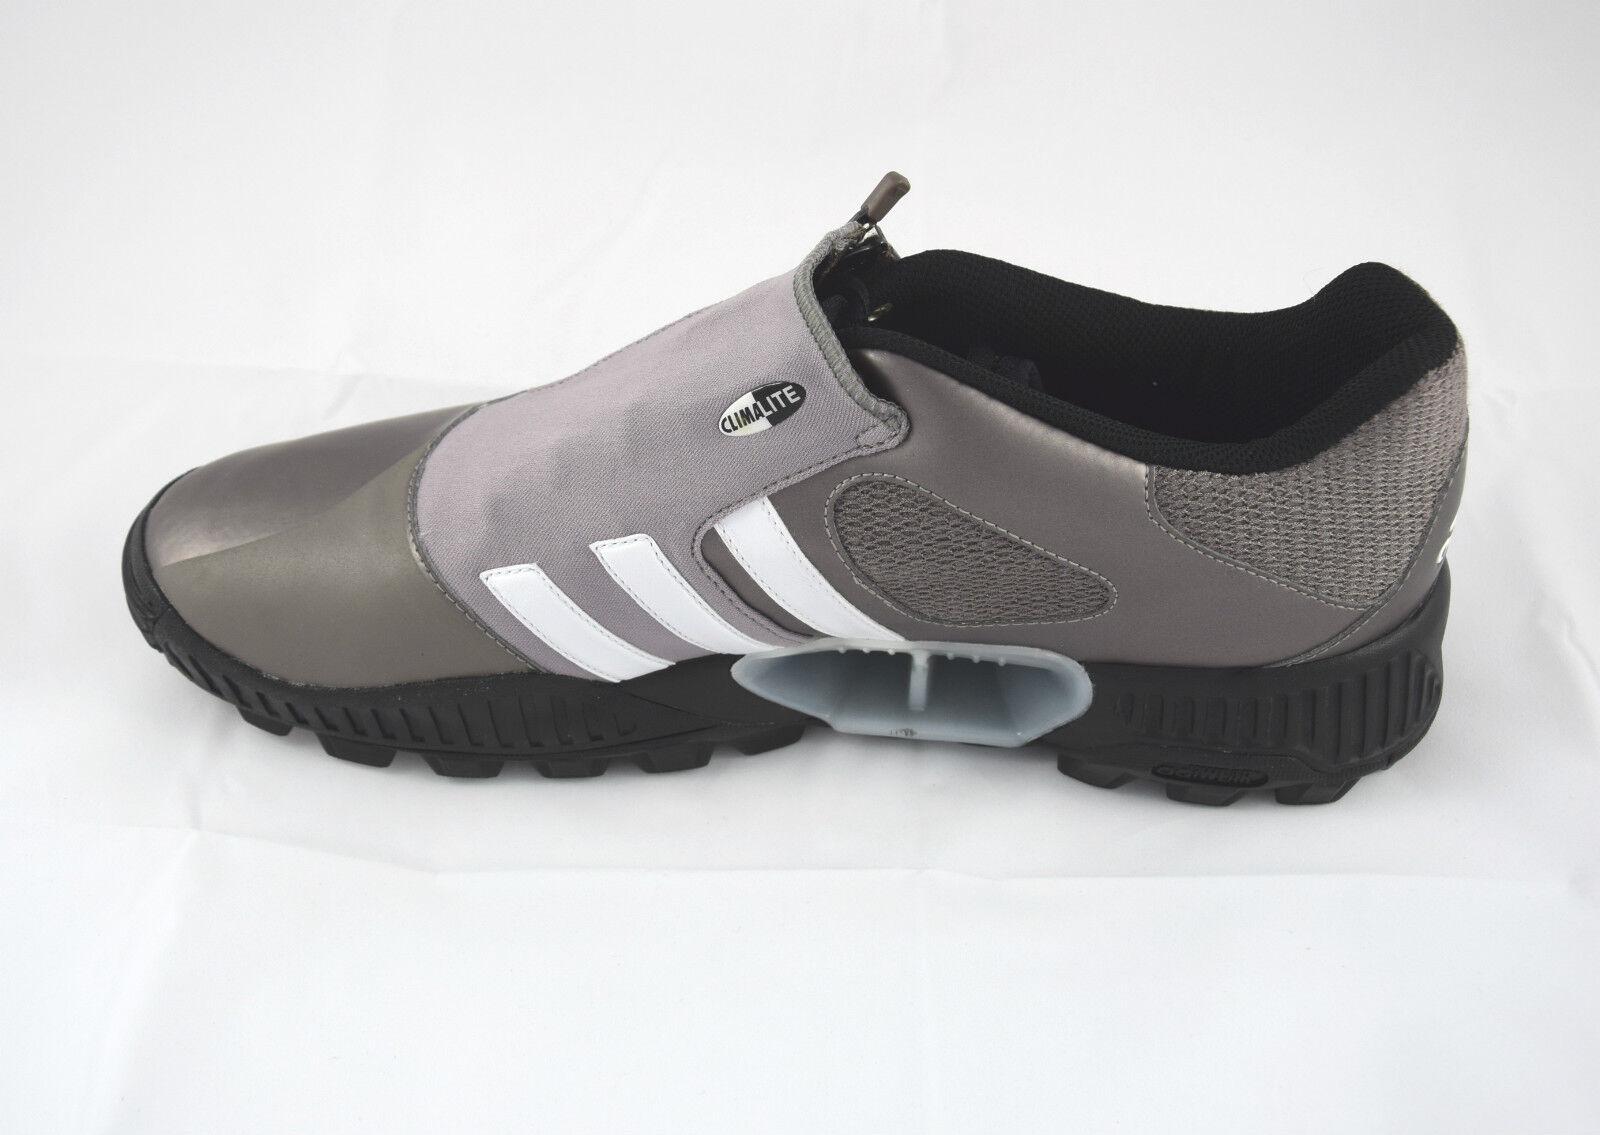 Adidas Adistar Adiprene Hockey Sport Chaussures Chaussures De Loisirs 46 2 3 NEUF    909251